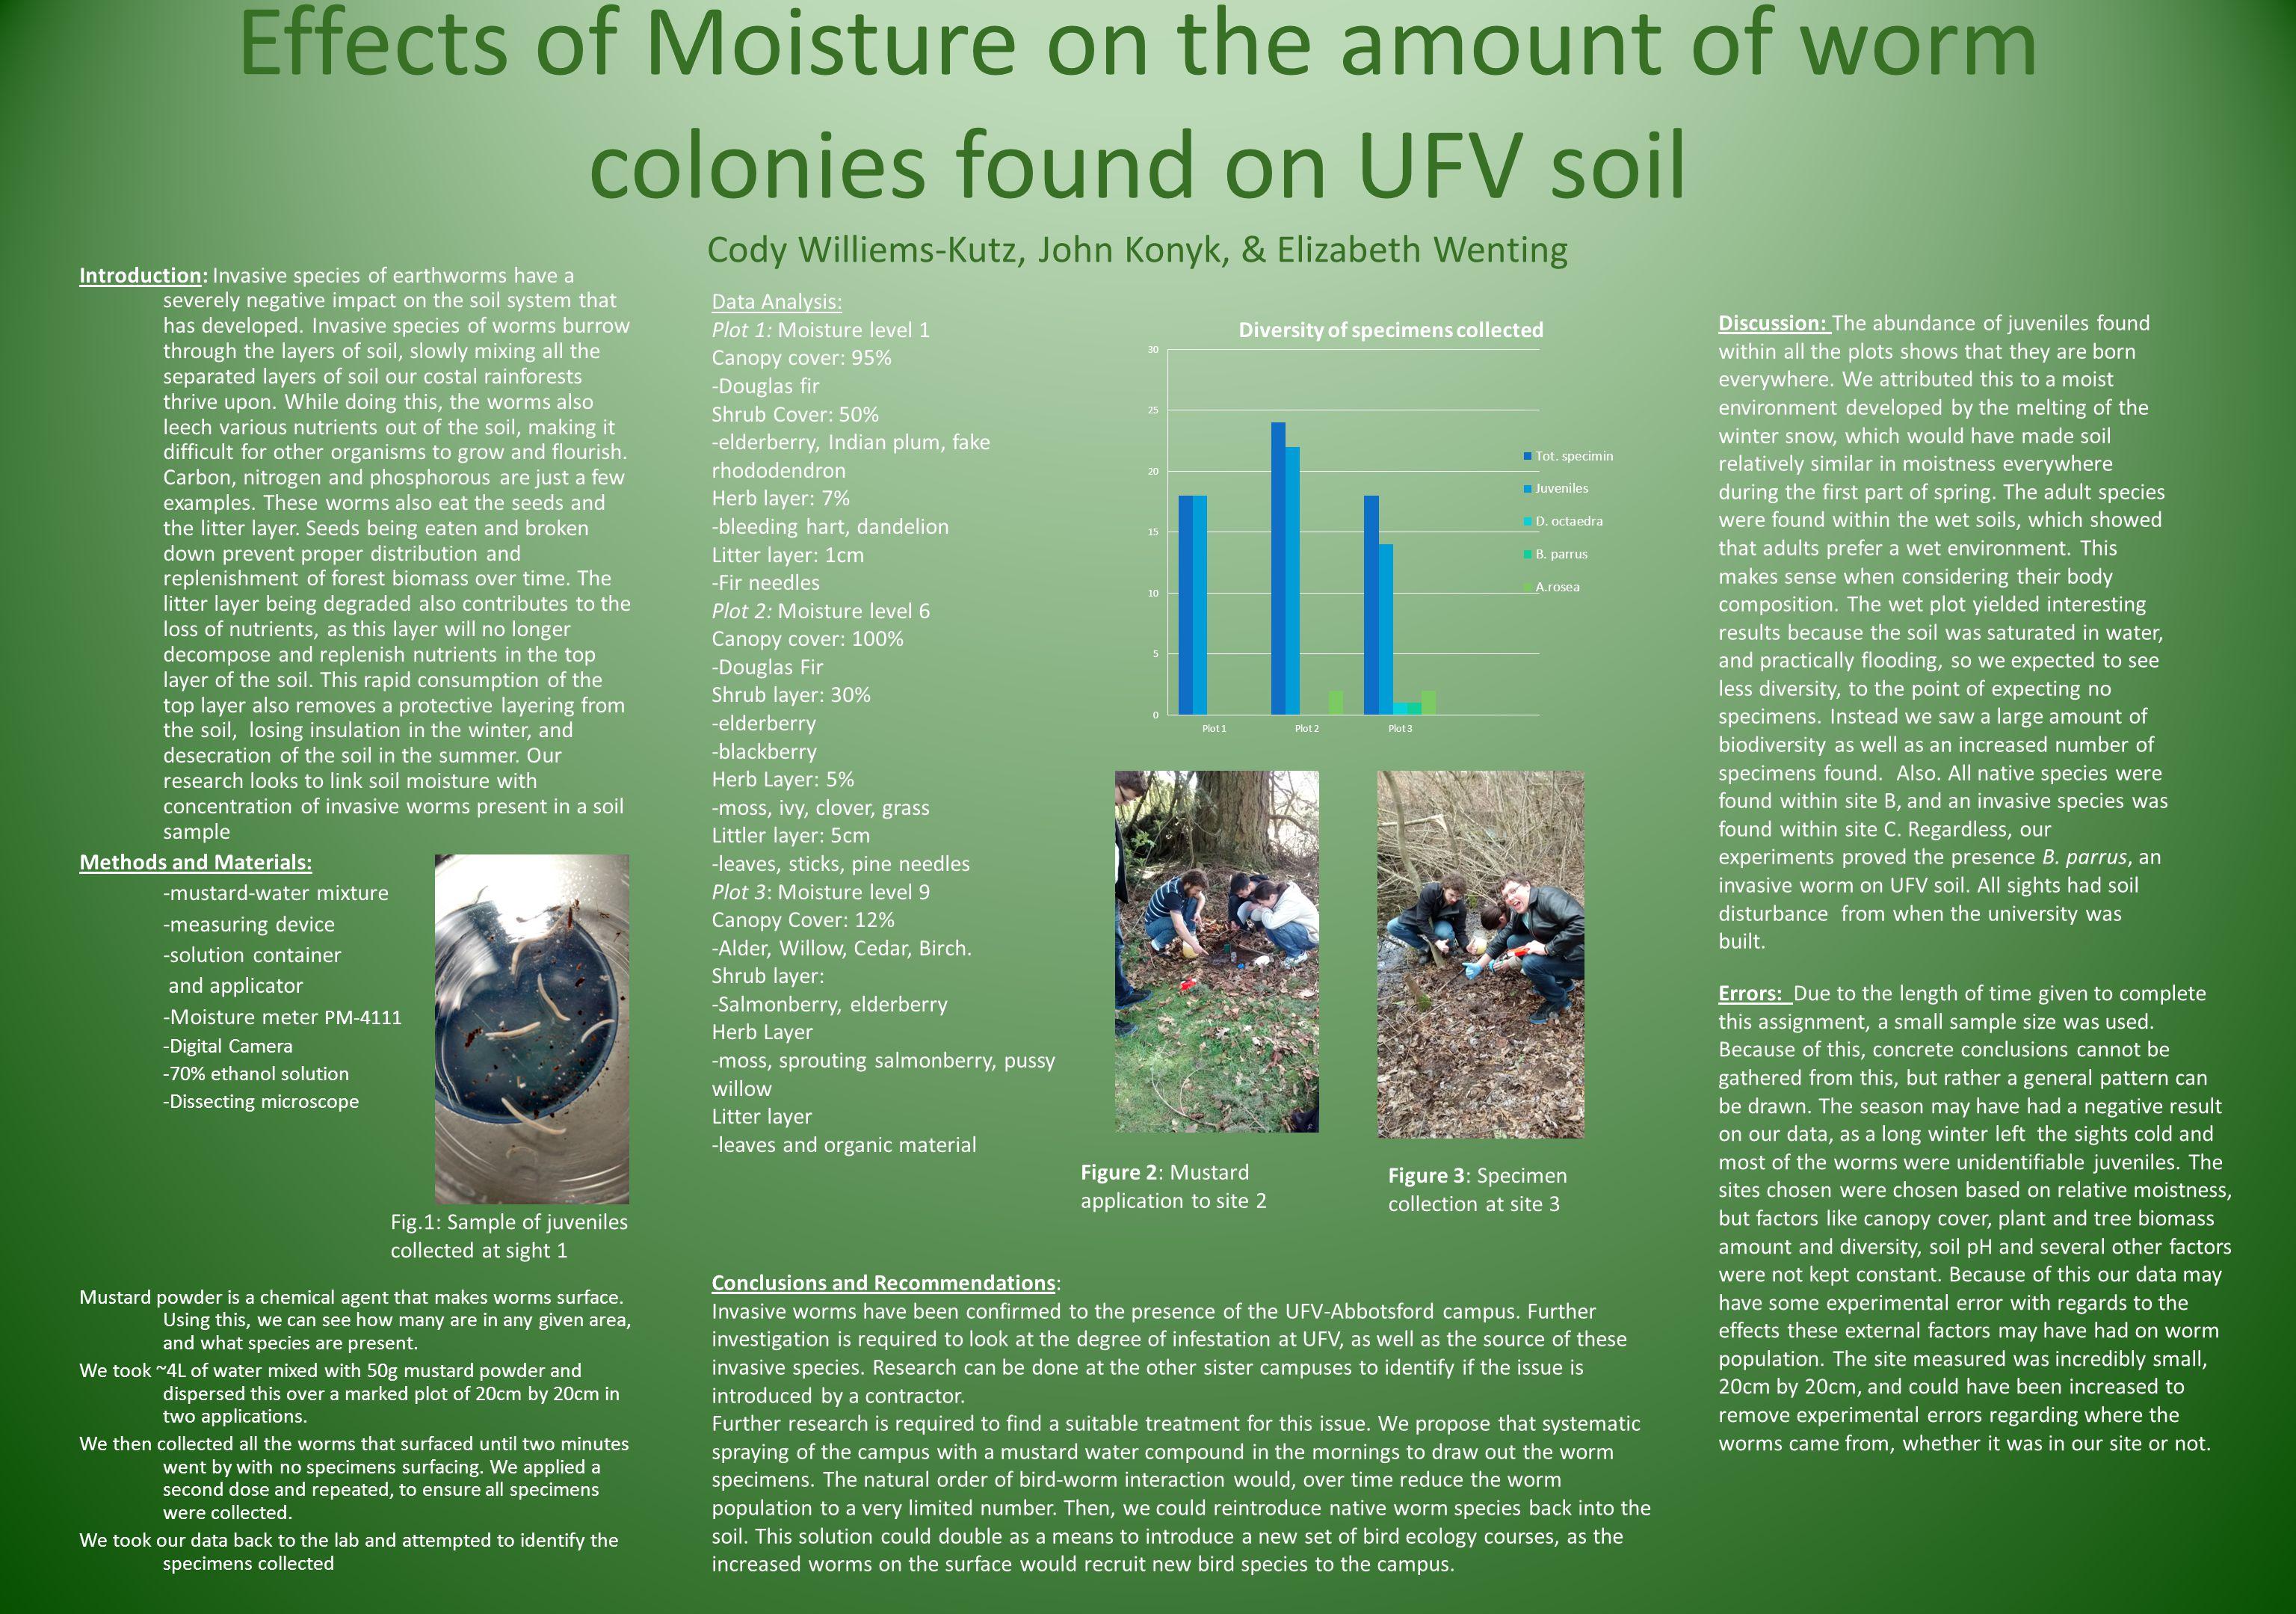 Effects of Moisture on the amount of worm colonies found on UFV soil Cody Williems-Kutz, John Konyk, & Elizabeth Wenting Introduction: Invasive specie